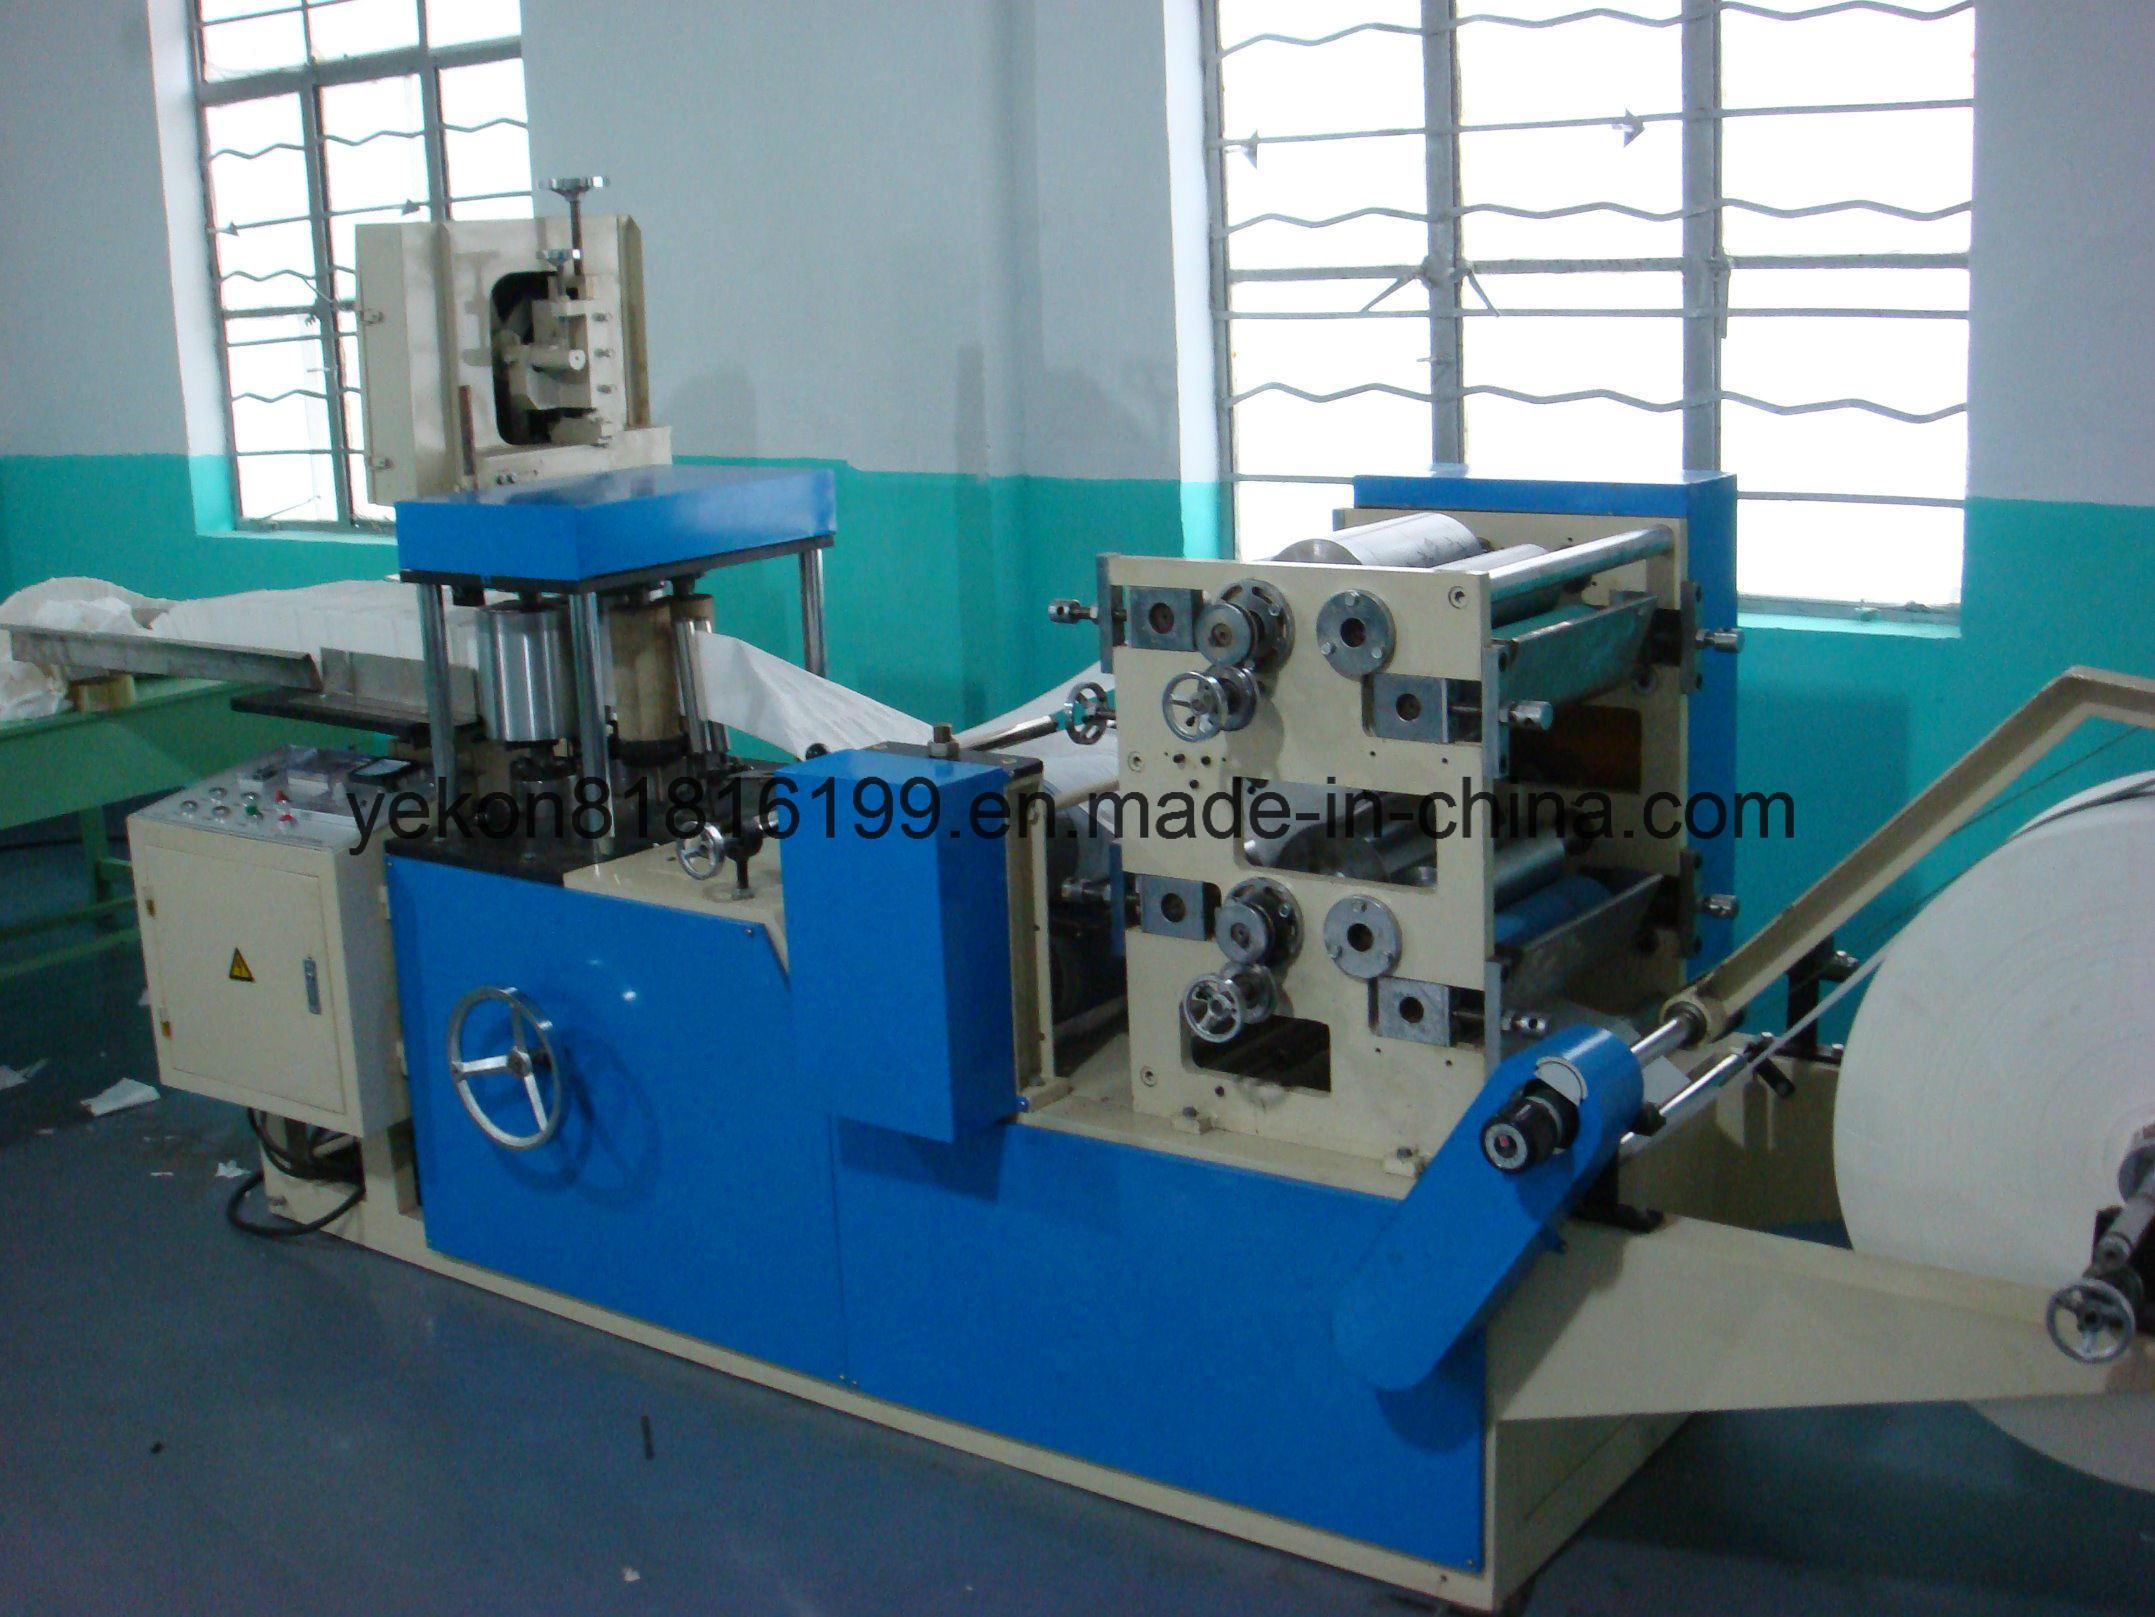 Yekon Automatick High Speed Napkin Folding Machine